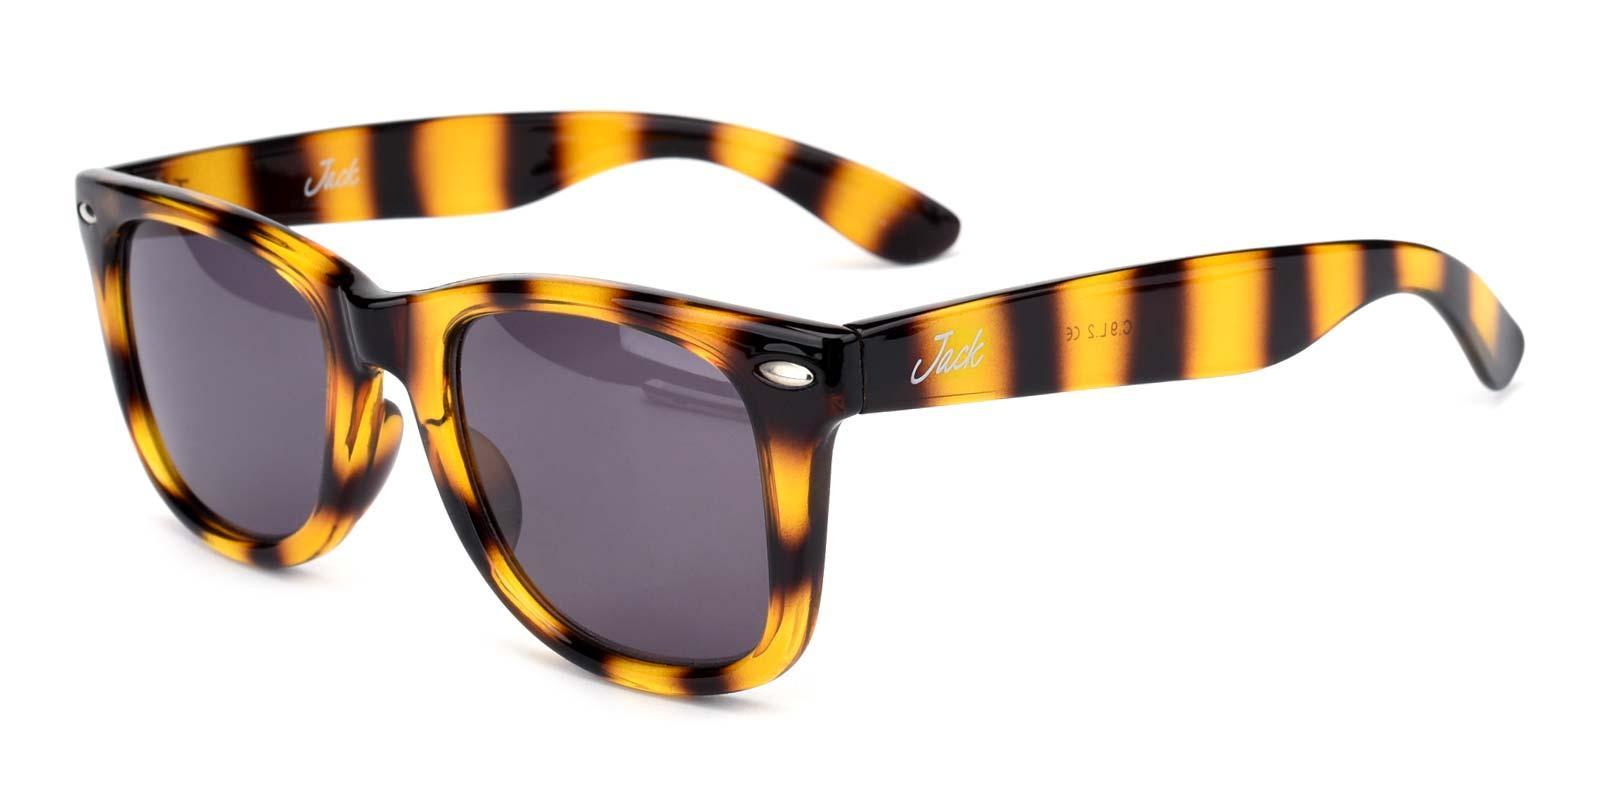 Honeybee-Tortoise-Square-TR-Sunglasses-additional1